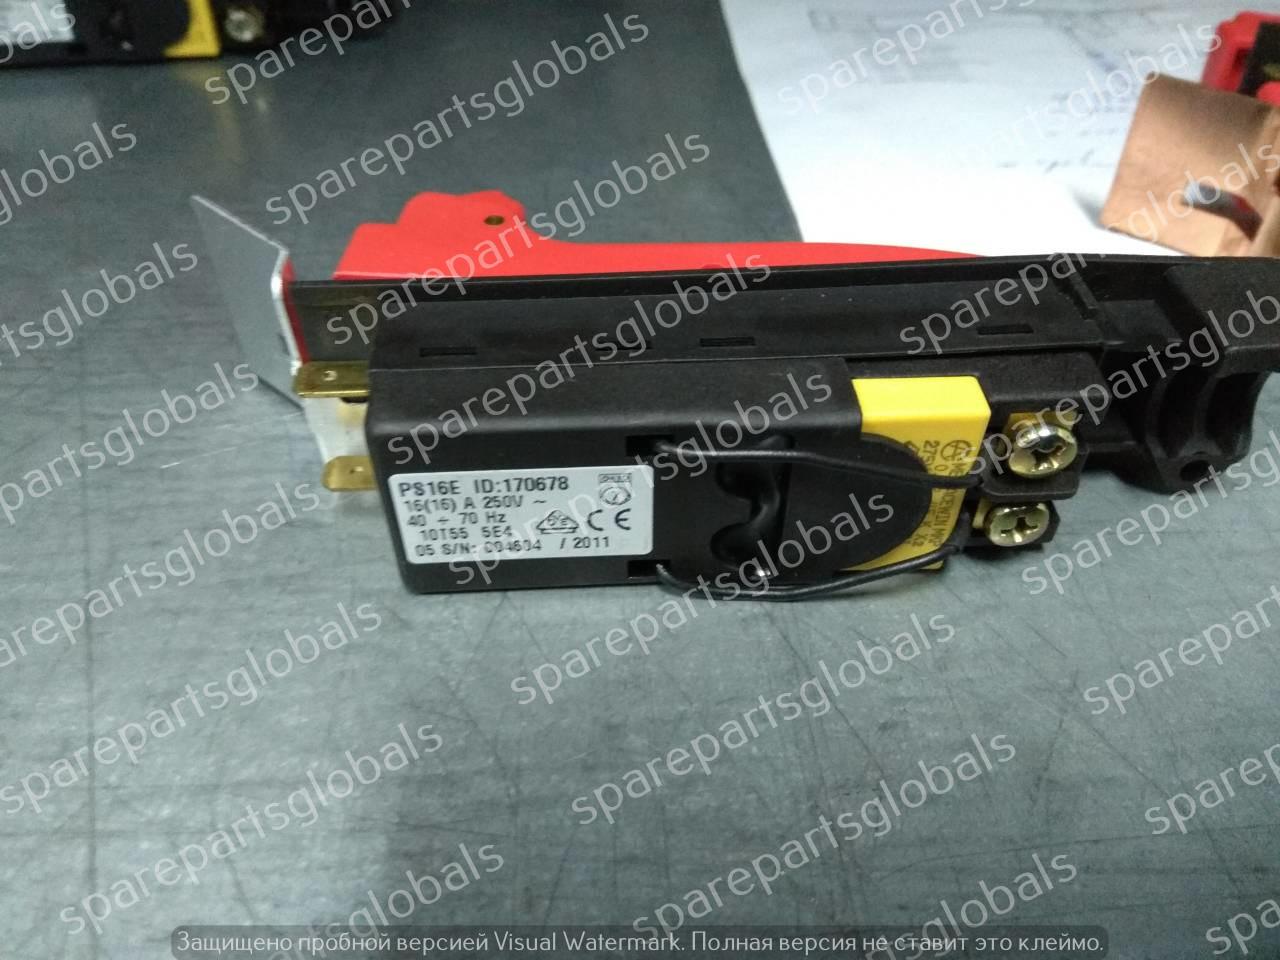 170678 Выключатель PS 16 E05 SPARKY